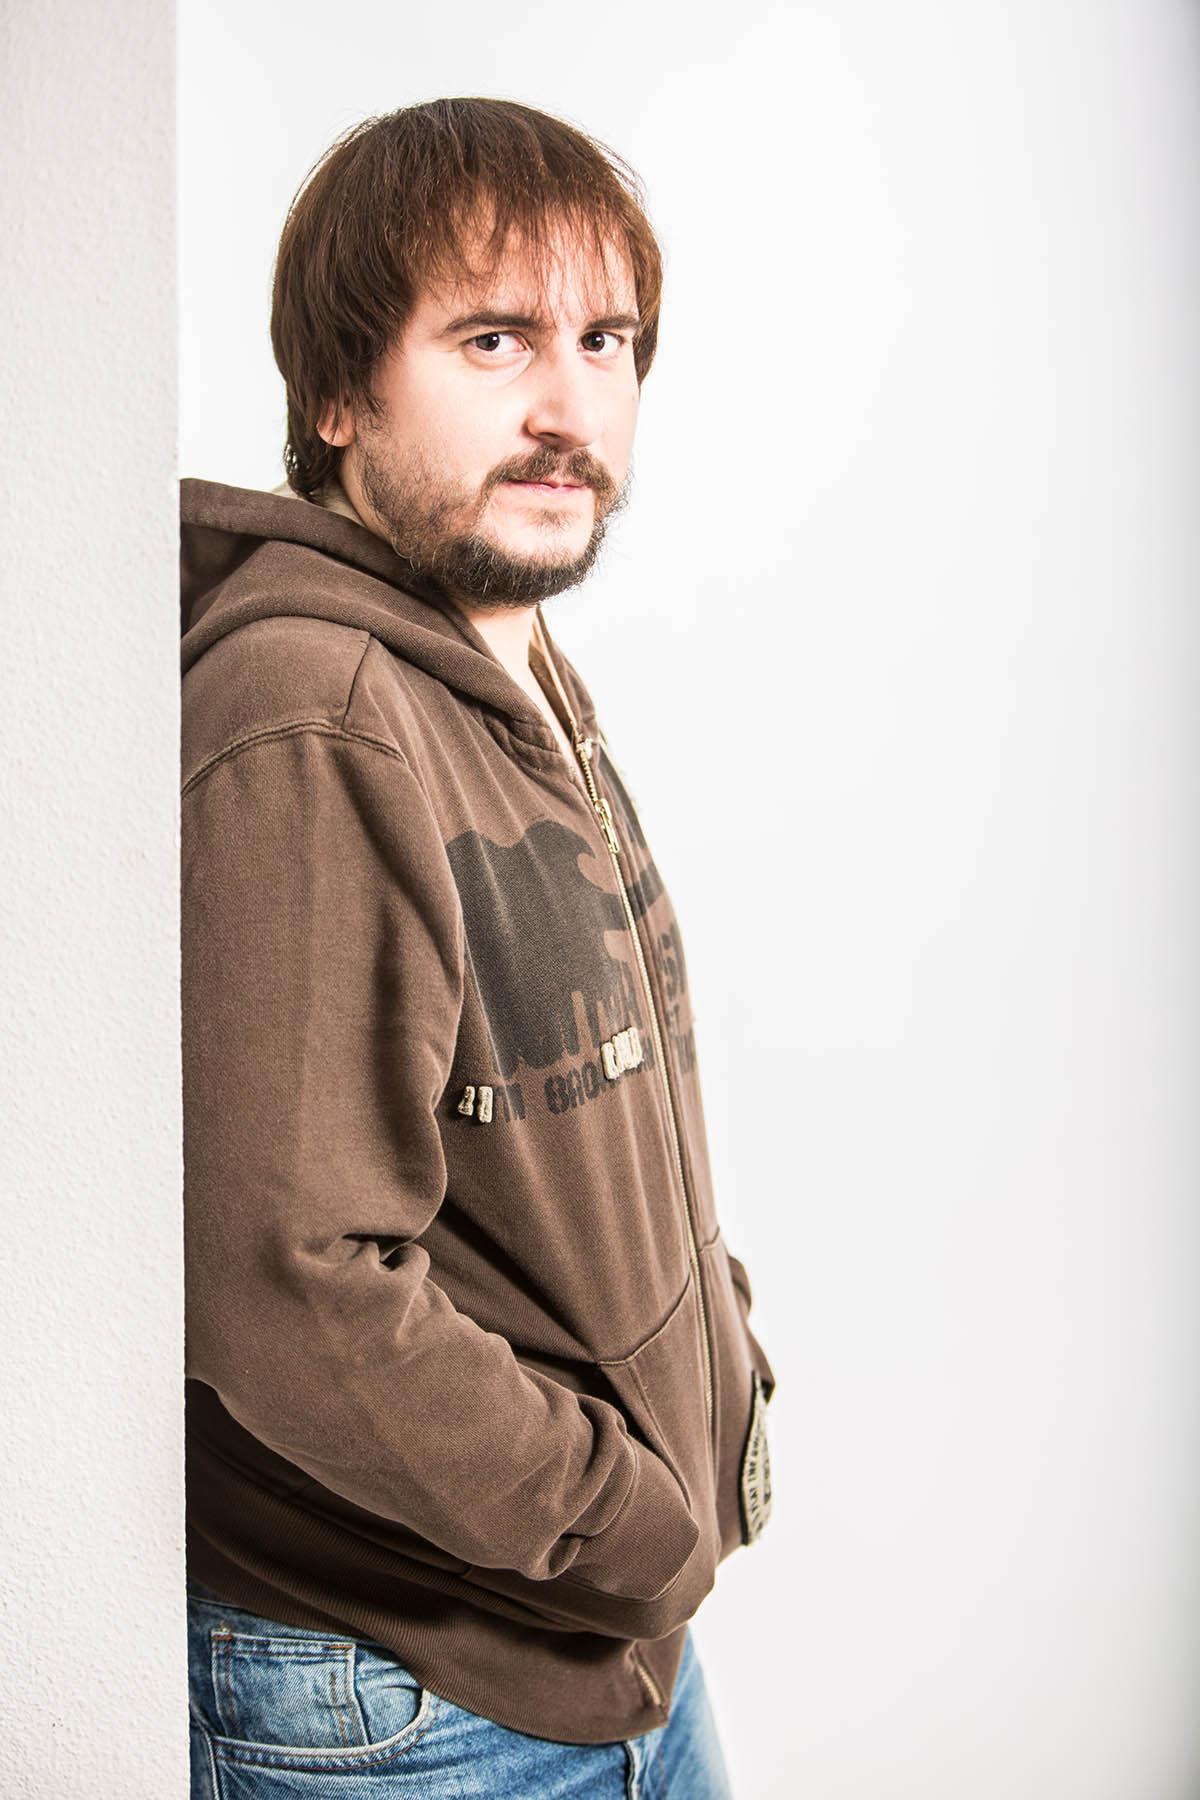 Felipe-Giner-medio-derecho-barba-pelo-largo-1